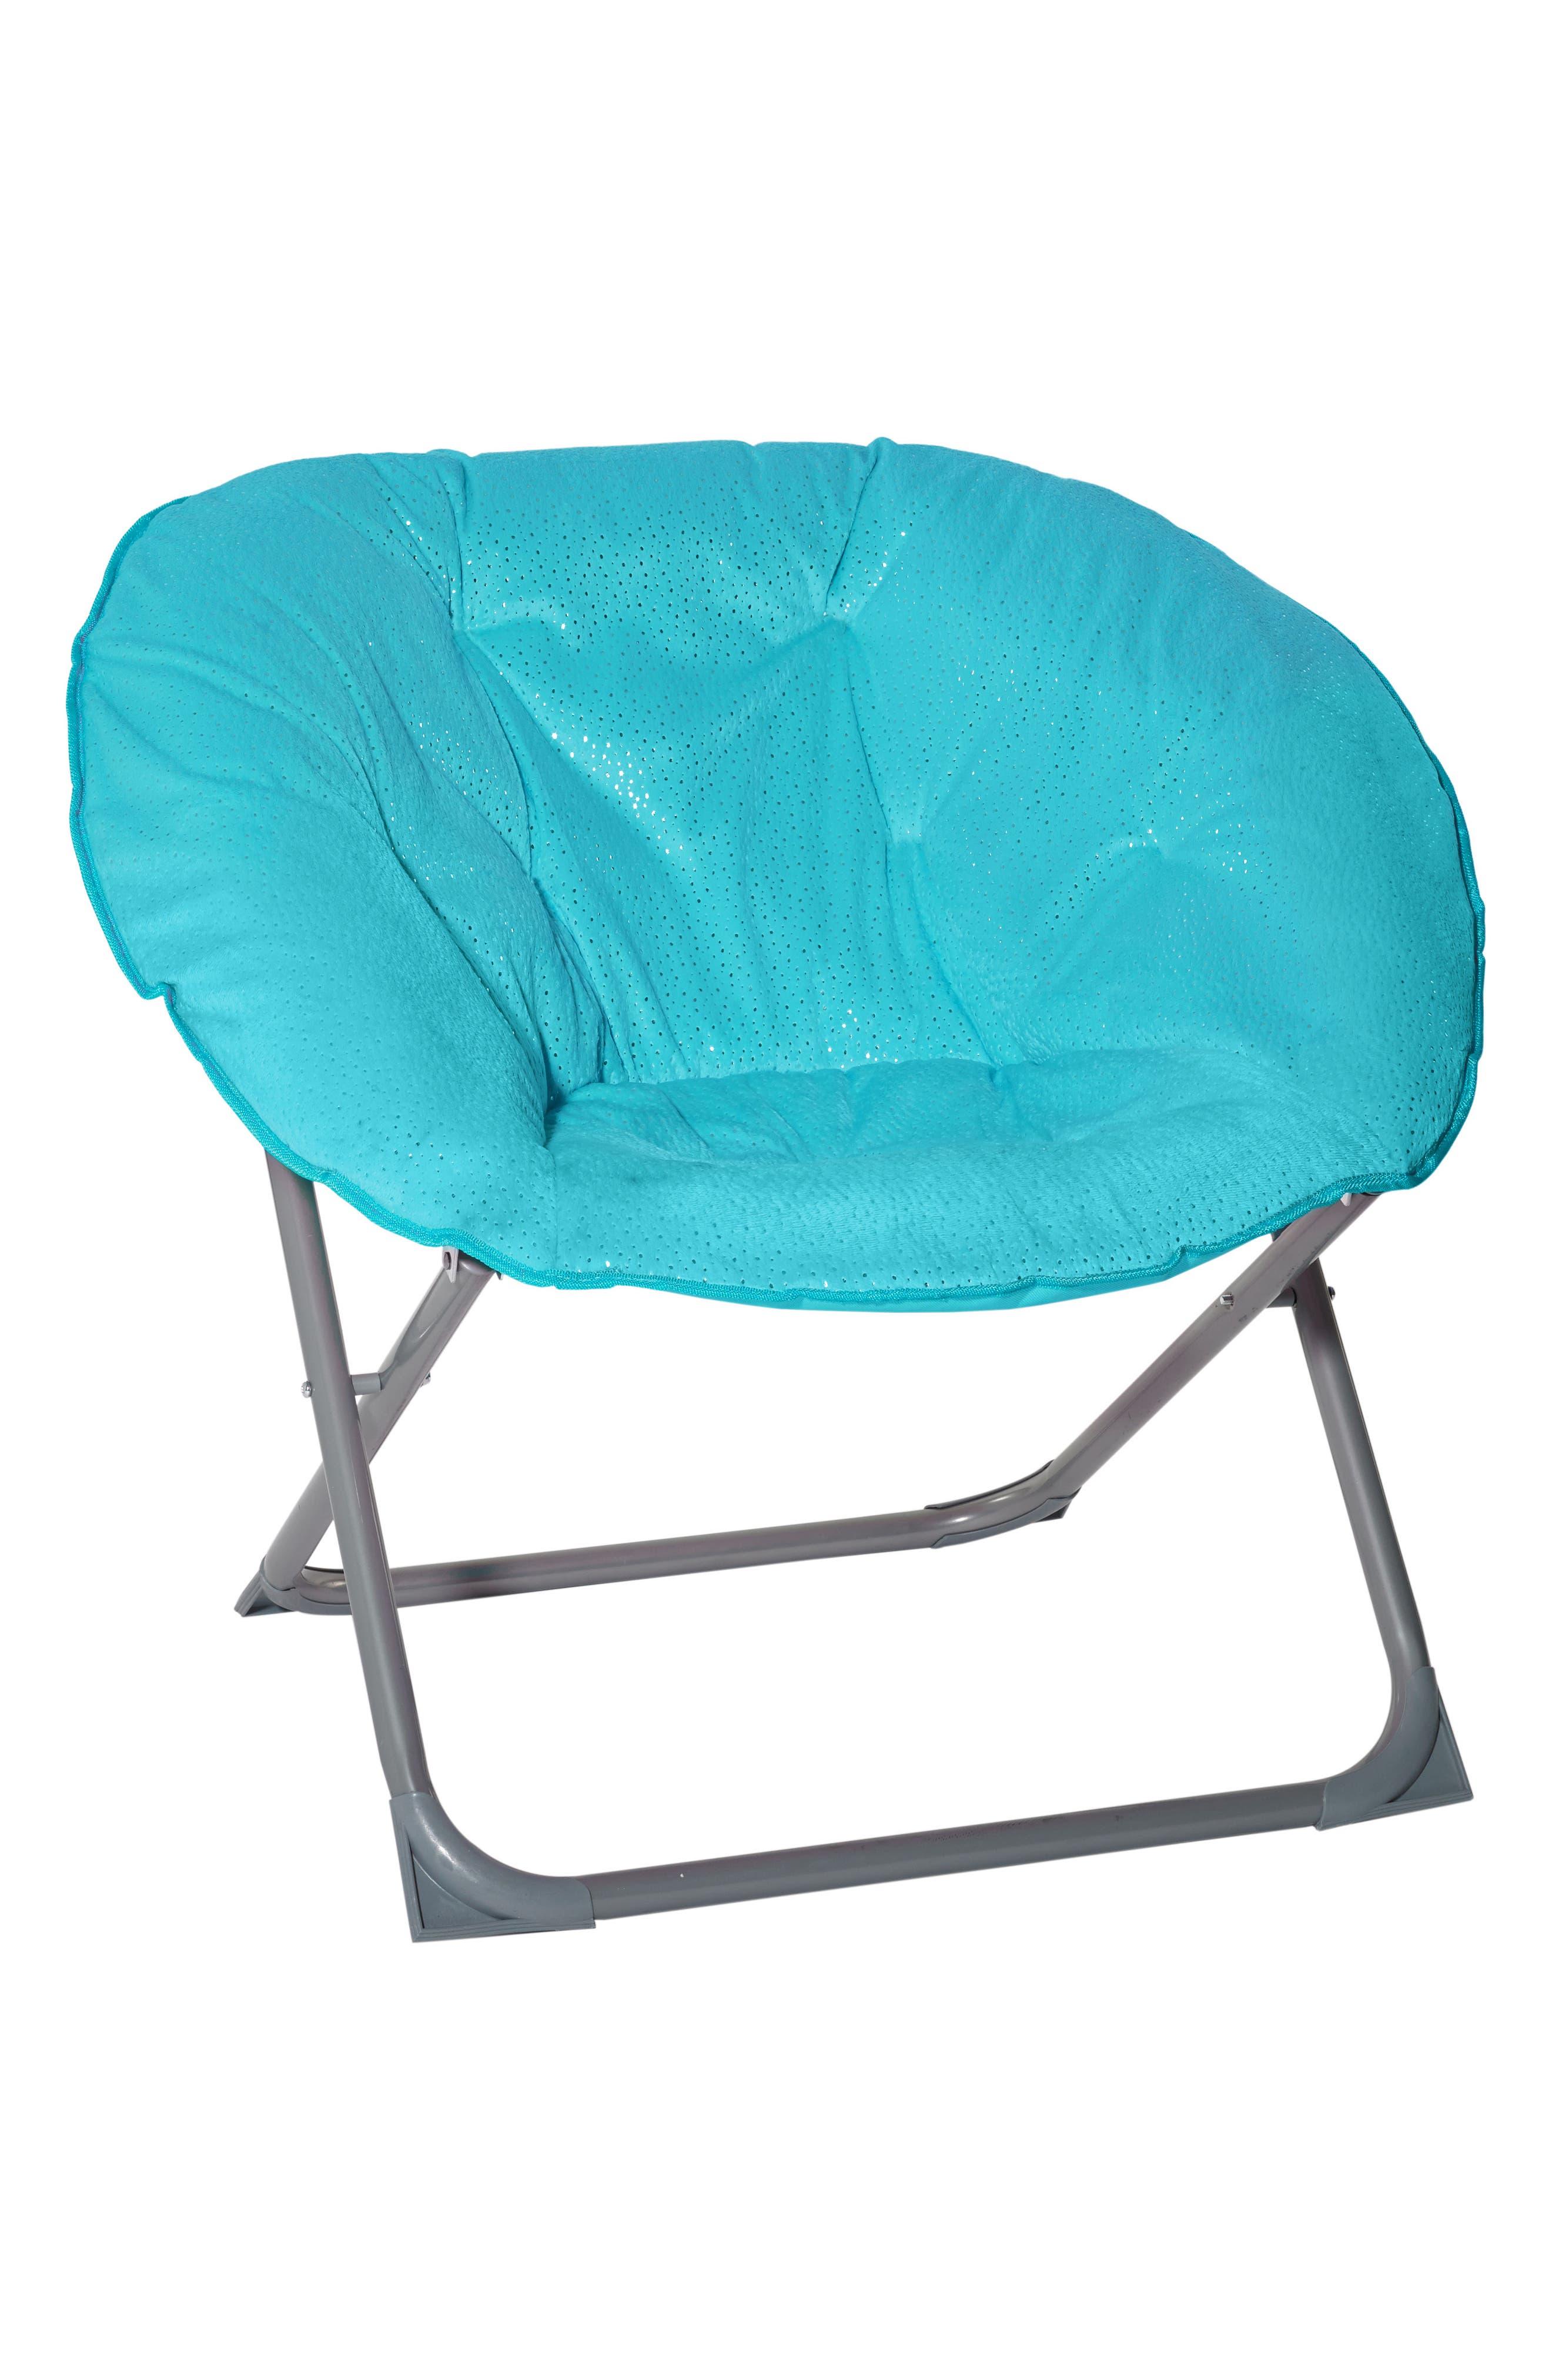 Sparkle Moon Chair,                             Alternate thumbnail 2, color,                             TURQUOISE